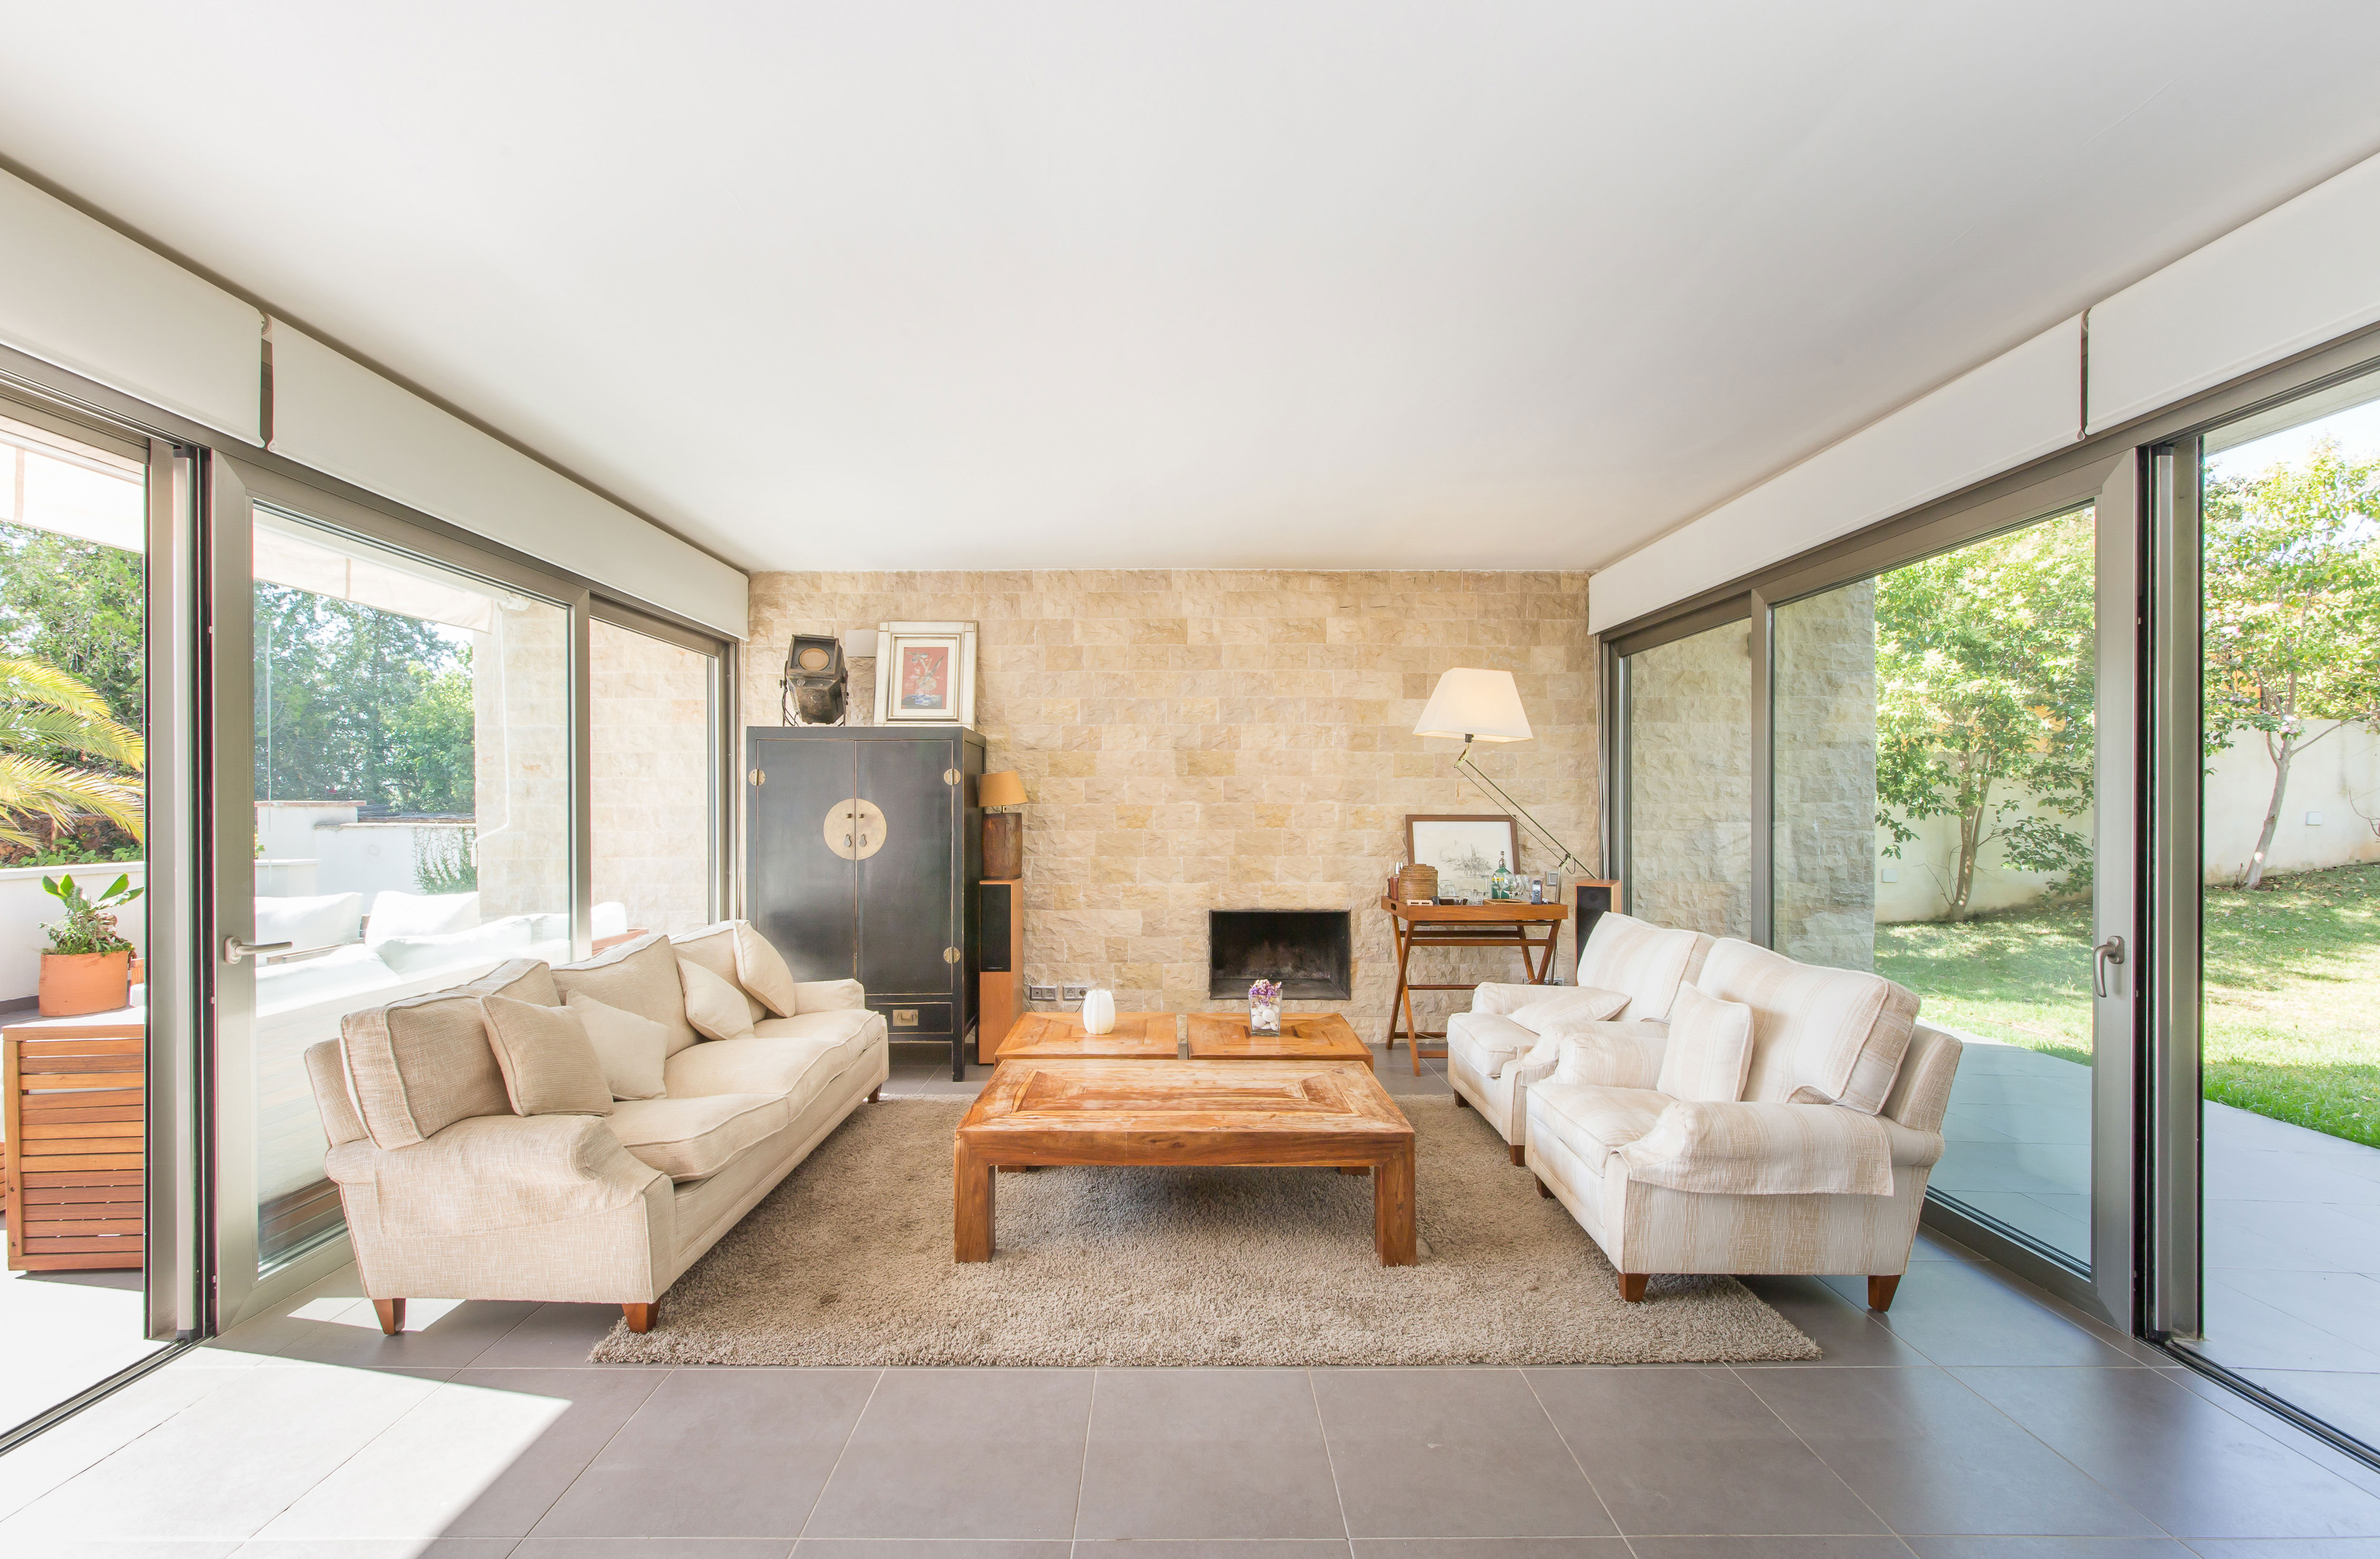 Fotografia Inmobiliaria - Fotografia Arquitectura - Valencia - Manuel Garcia - DestacaTuCasa